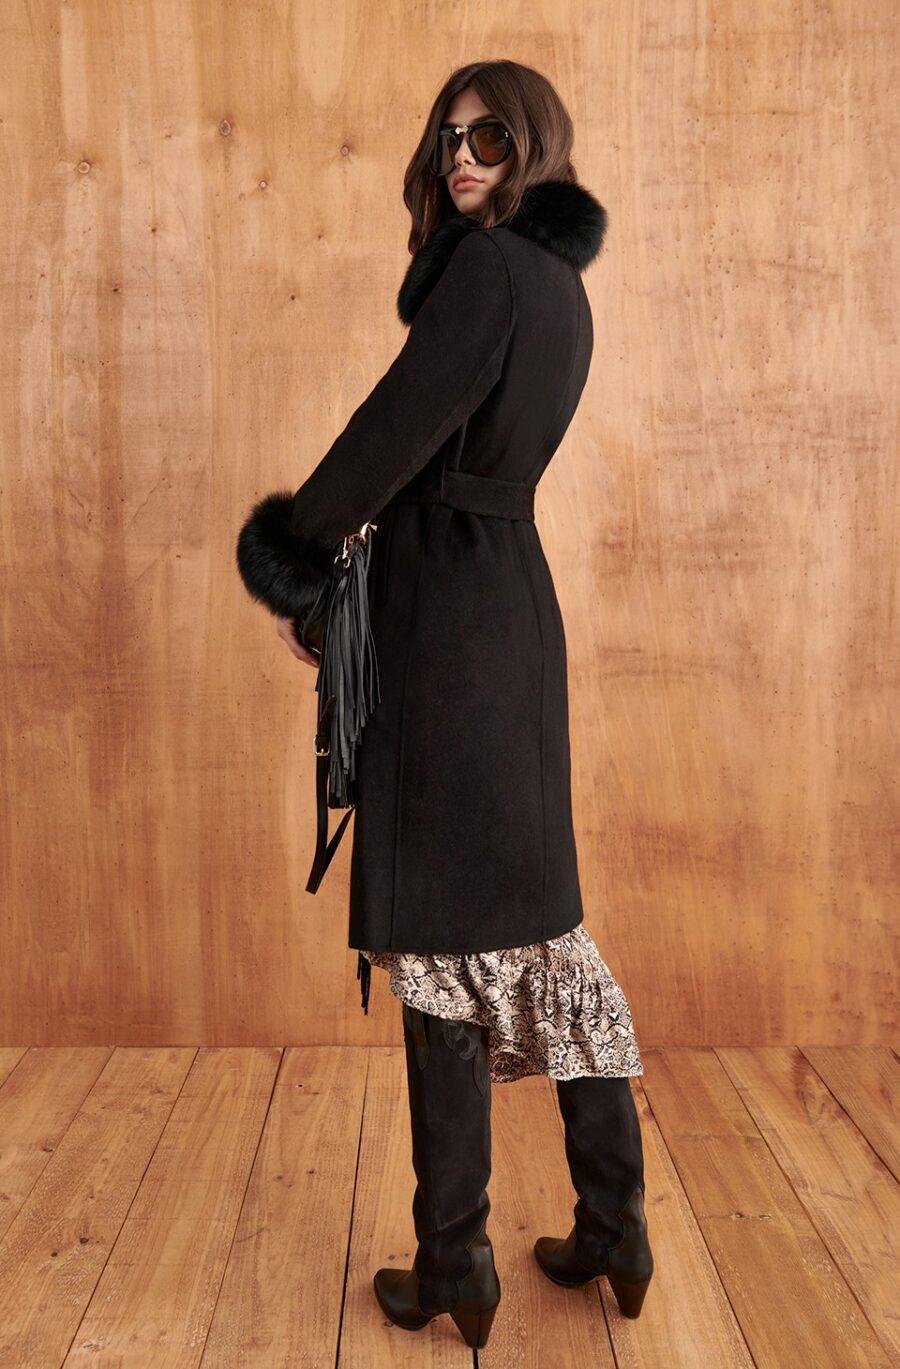 <ul> <li>Abrigo de color negro con detalle de puños y cuello desmontable de pelo natural para poder proceder a su limpieza profesional</li> <li>Marca Fetiche</li> <li>Con bolsillo</li> <li>Detalle de flecos</li> <li>Botones dorados</li> <li>90% Lana y 10% Cashemere</li> <li>La modelo lleva la talla S y mide 1.80cm</li> </ul> Alabama Shop